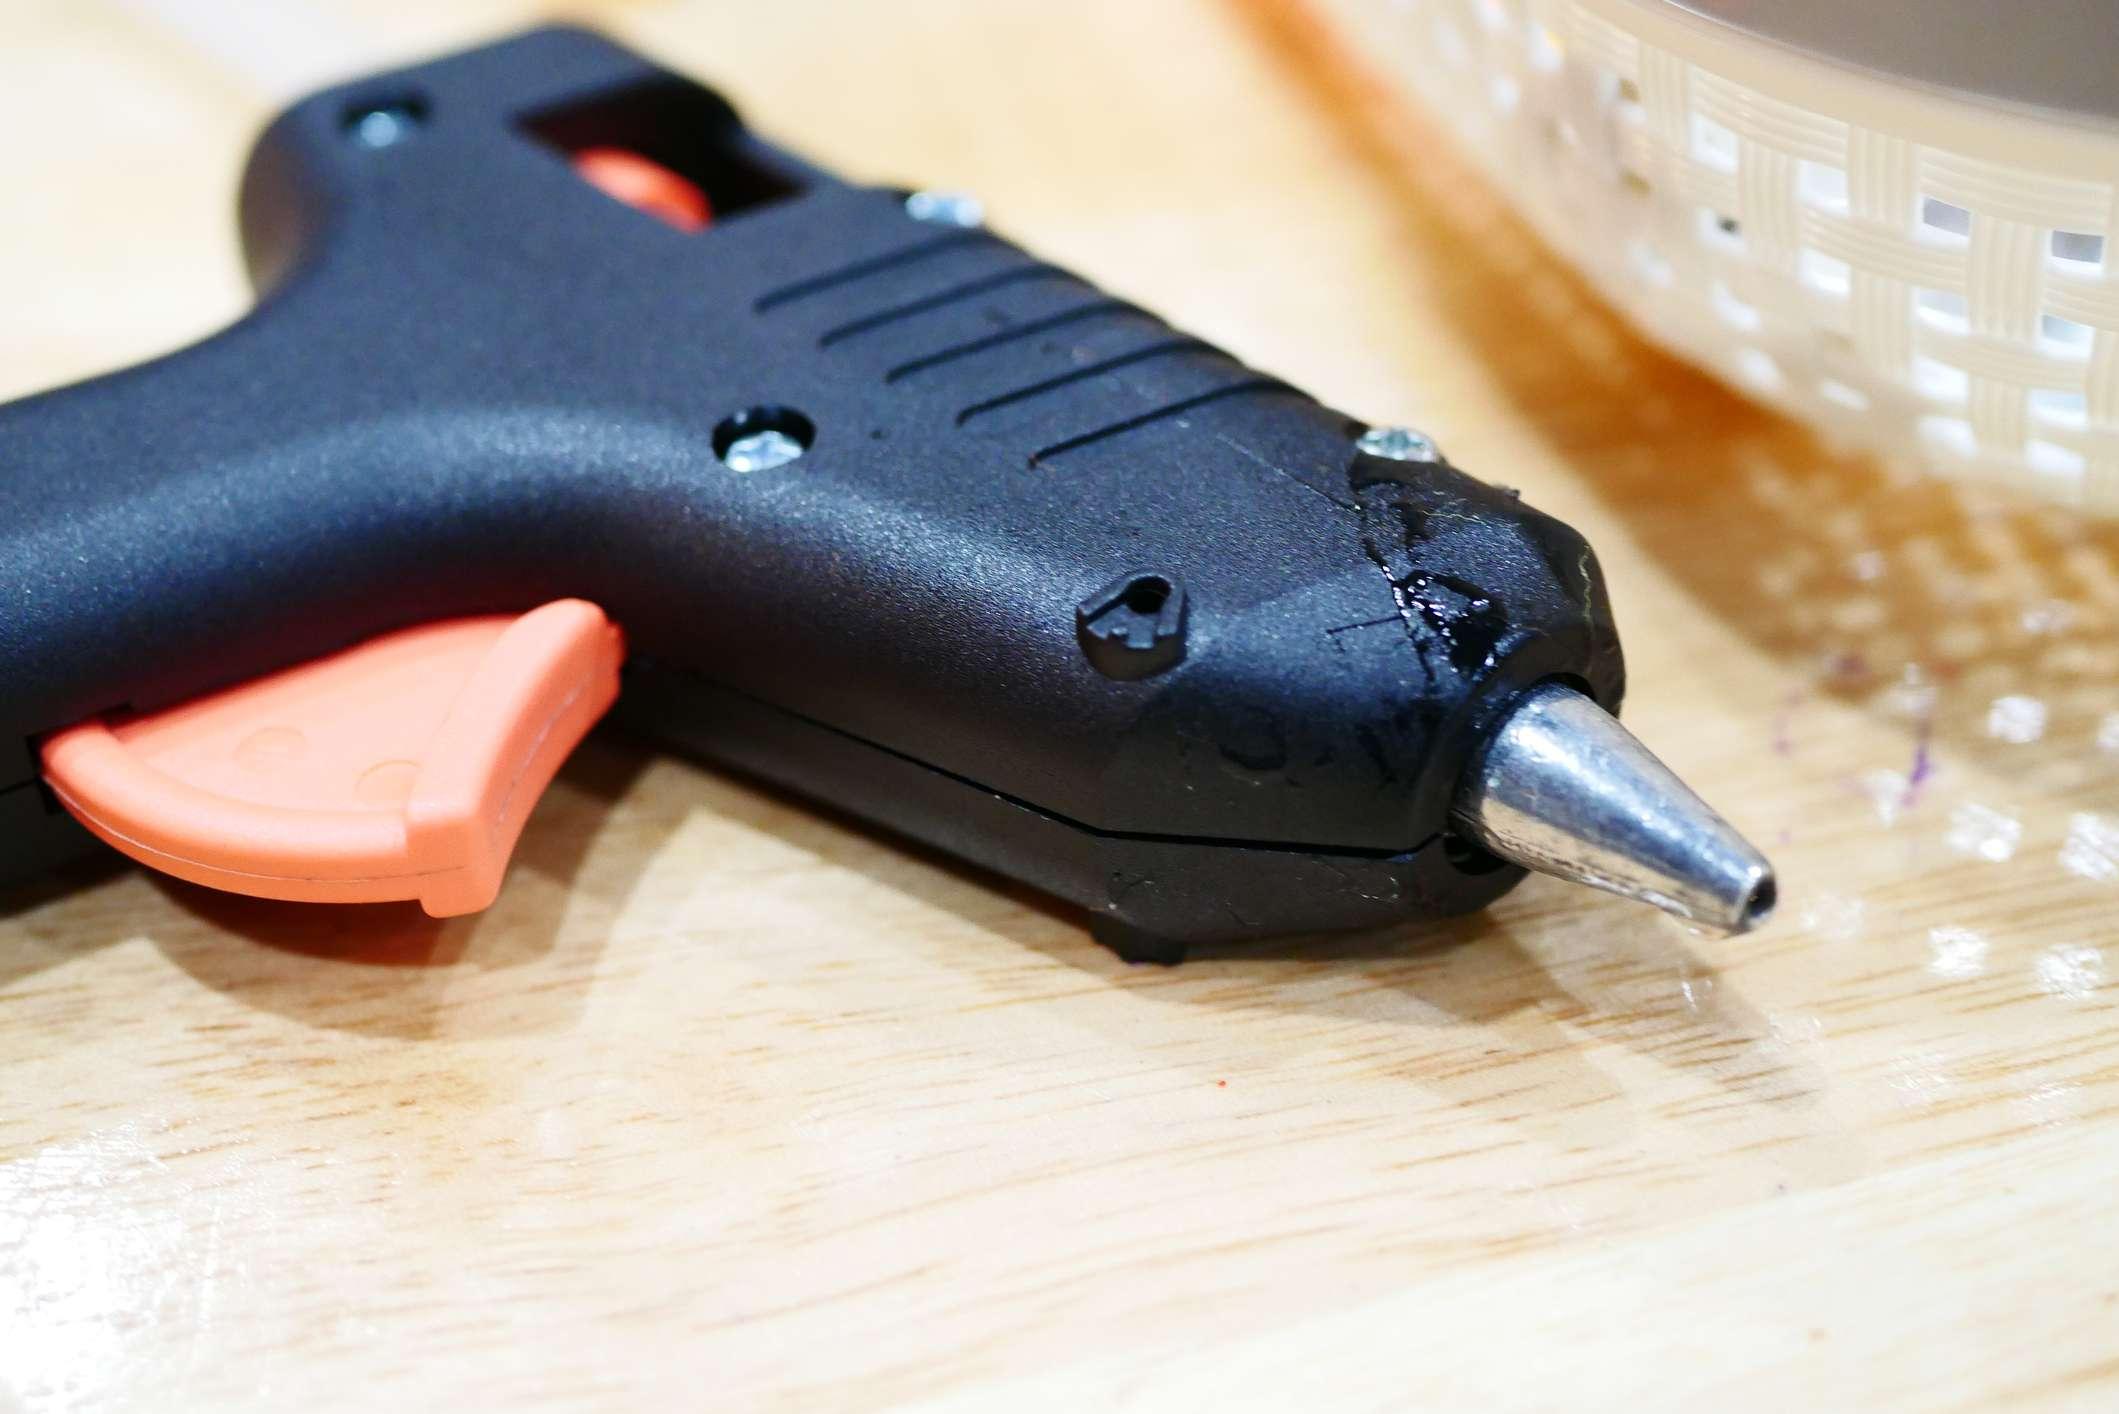 Hot glue gun on table